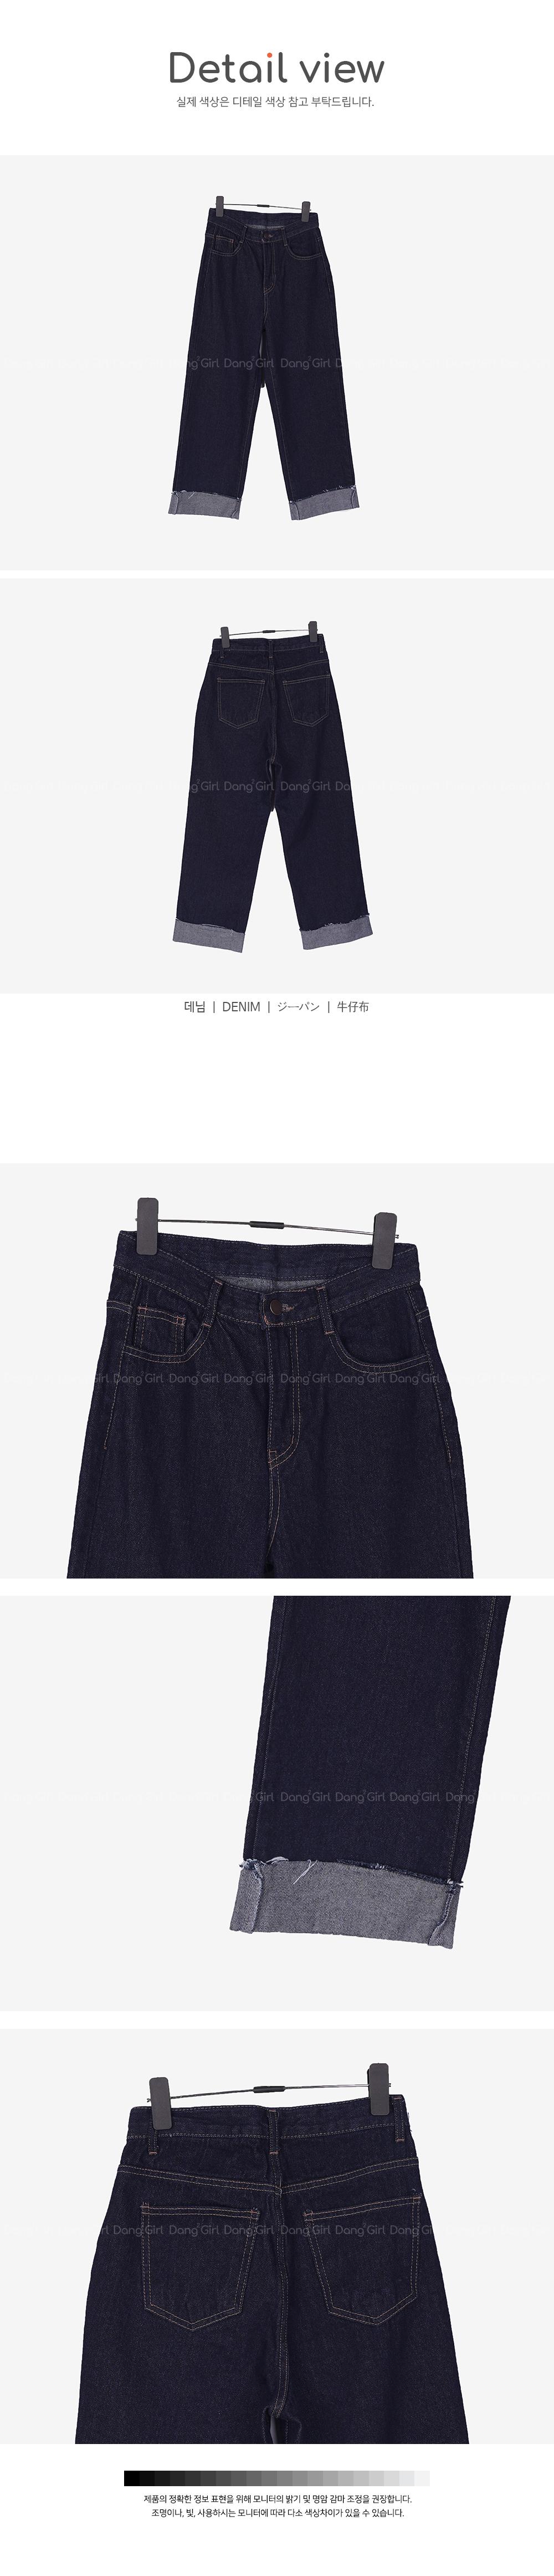 Big 26-38 Inch Stein Roll-Up Wide Denim Pants